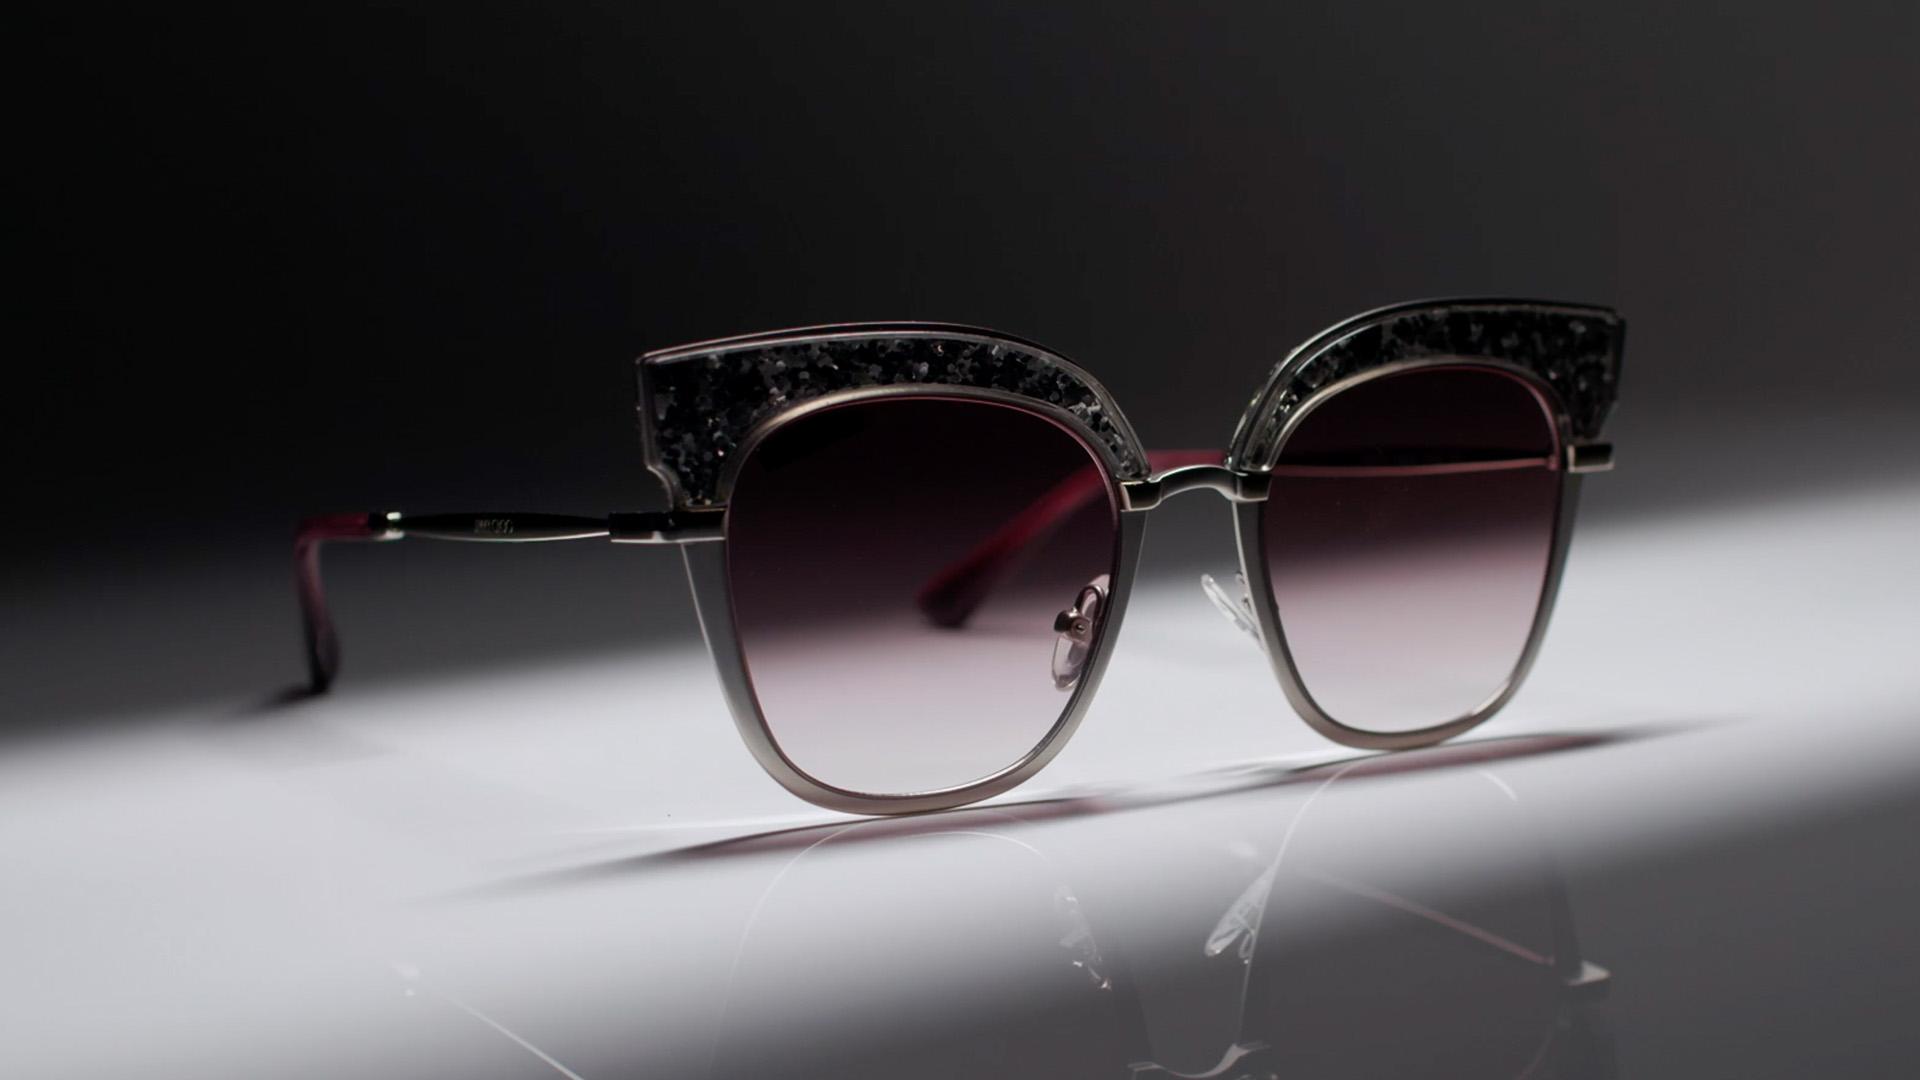 NYWD – Eyewear distributor